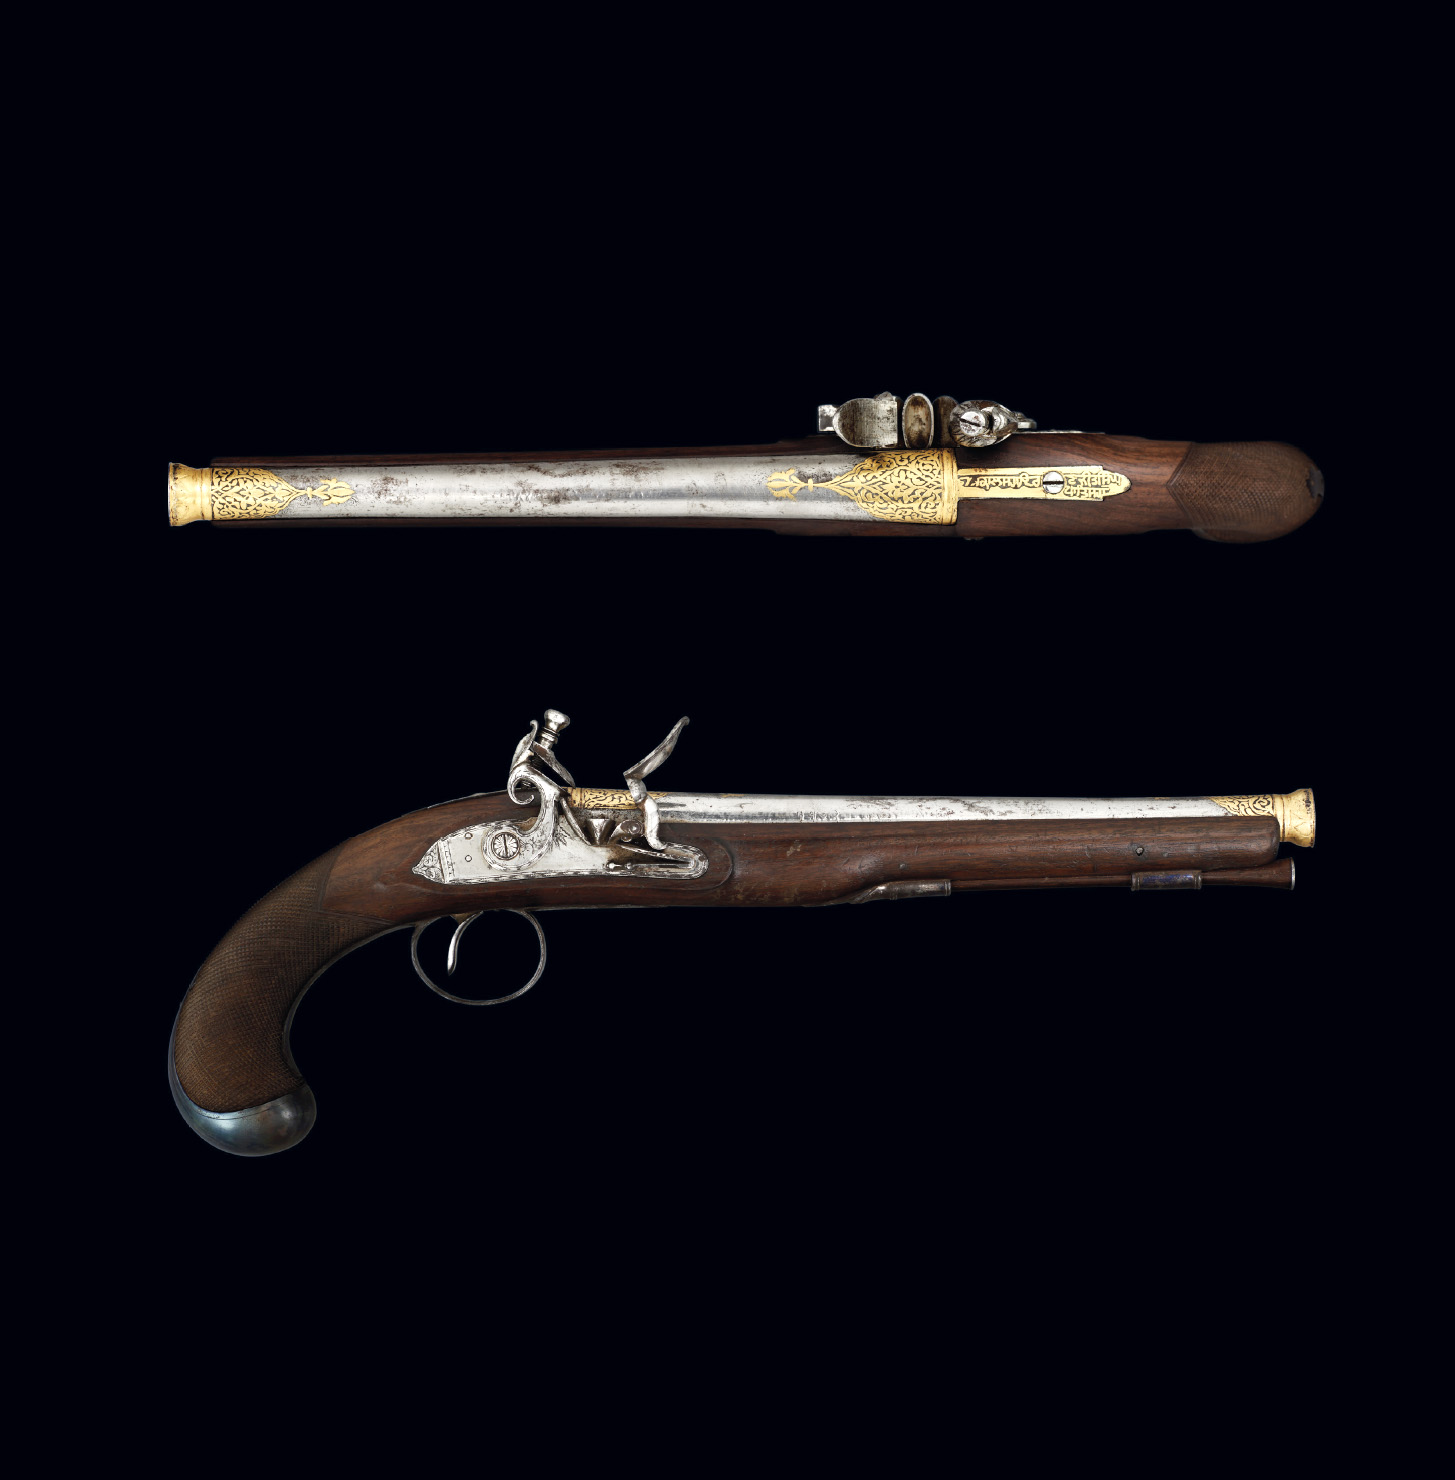 Flintlock pistol belonging to Maharaja Ranjit Singh